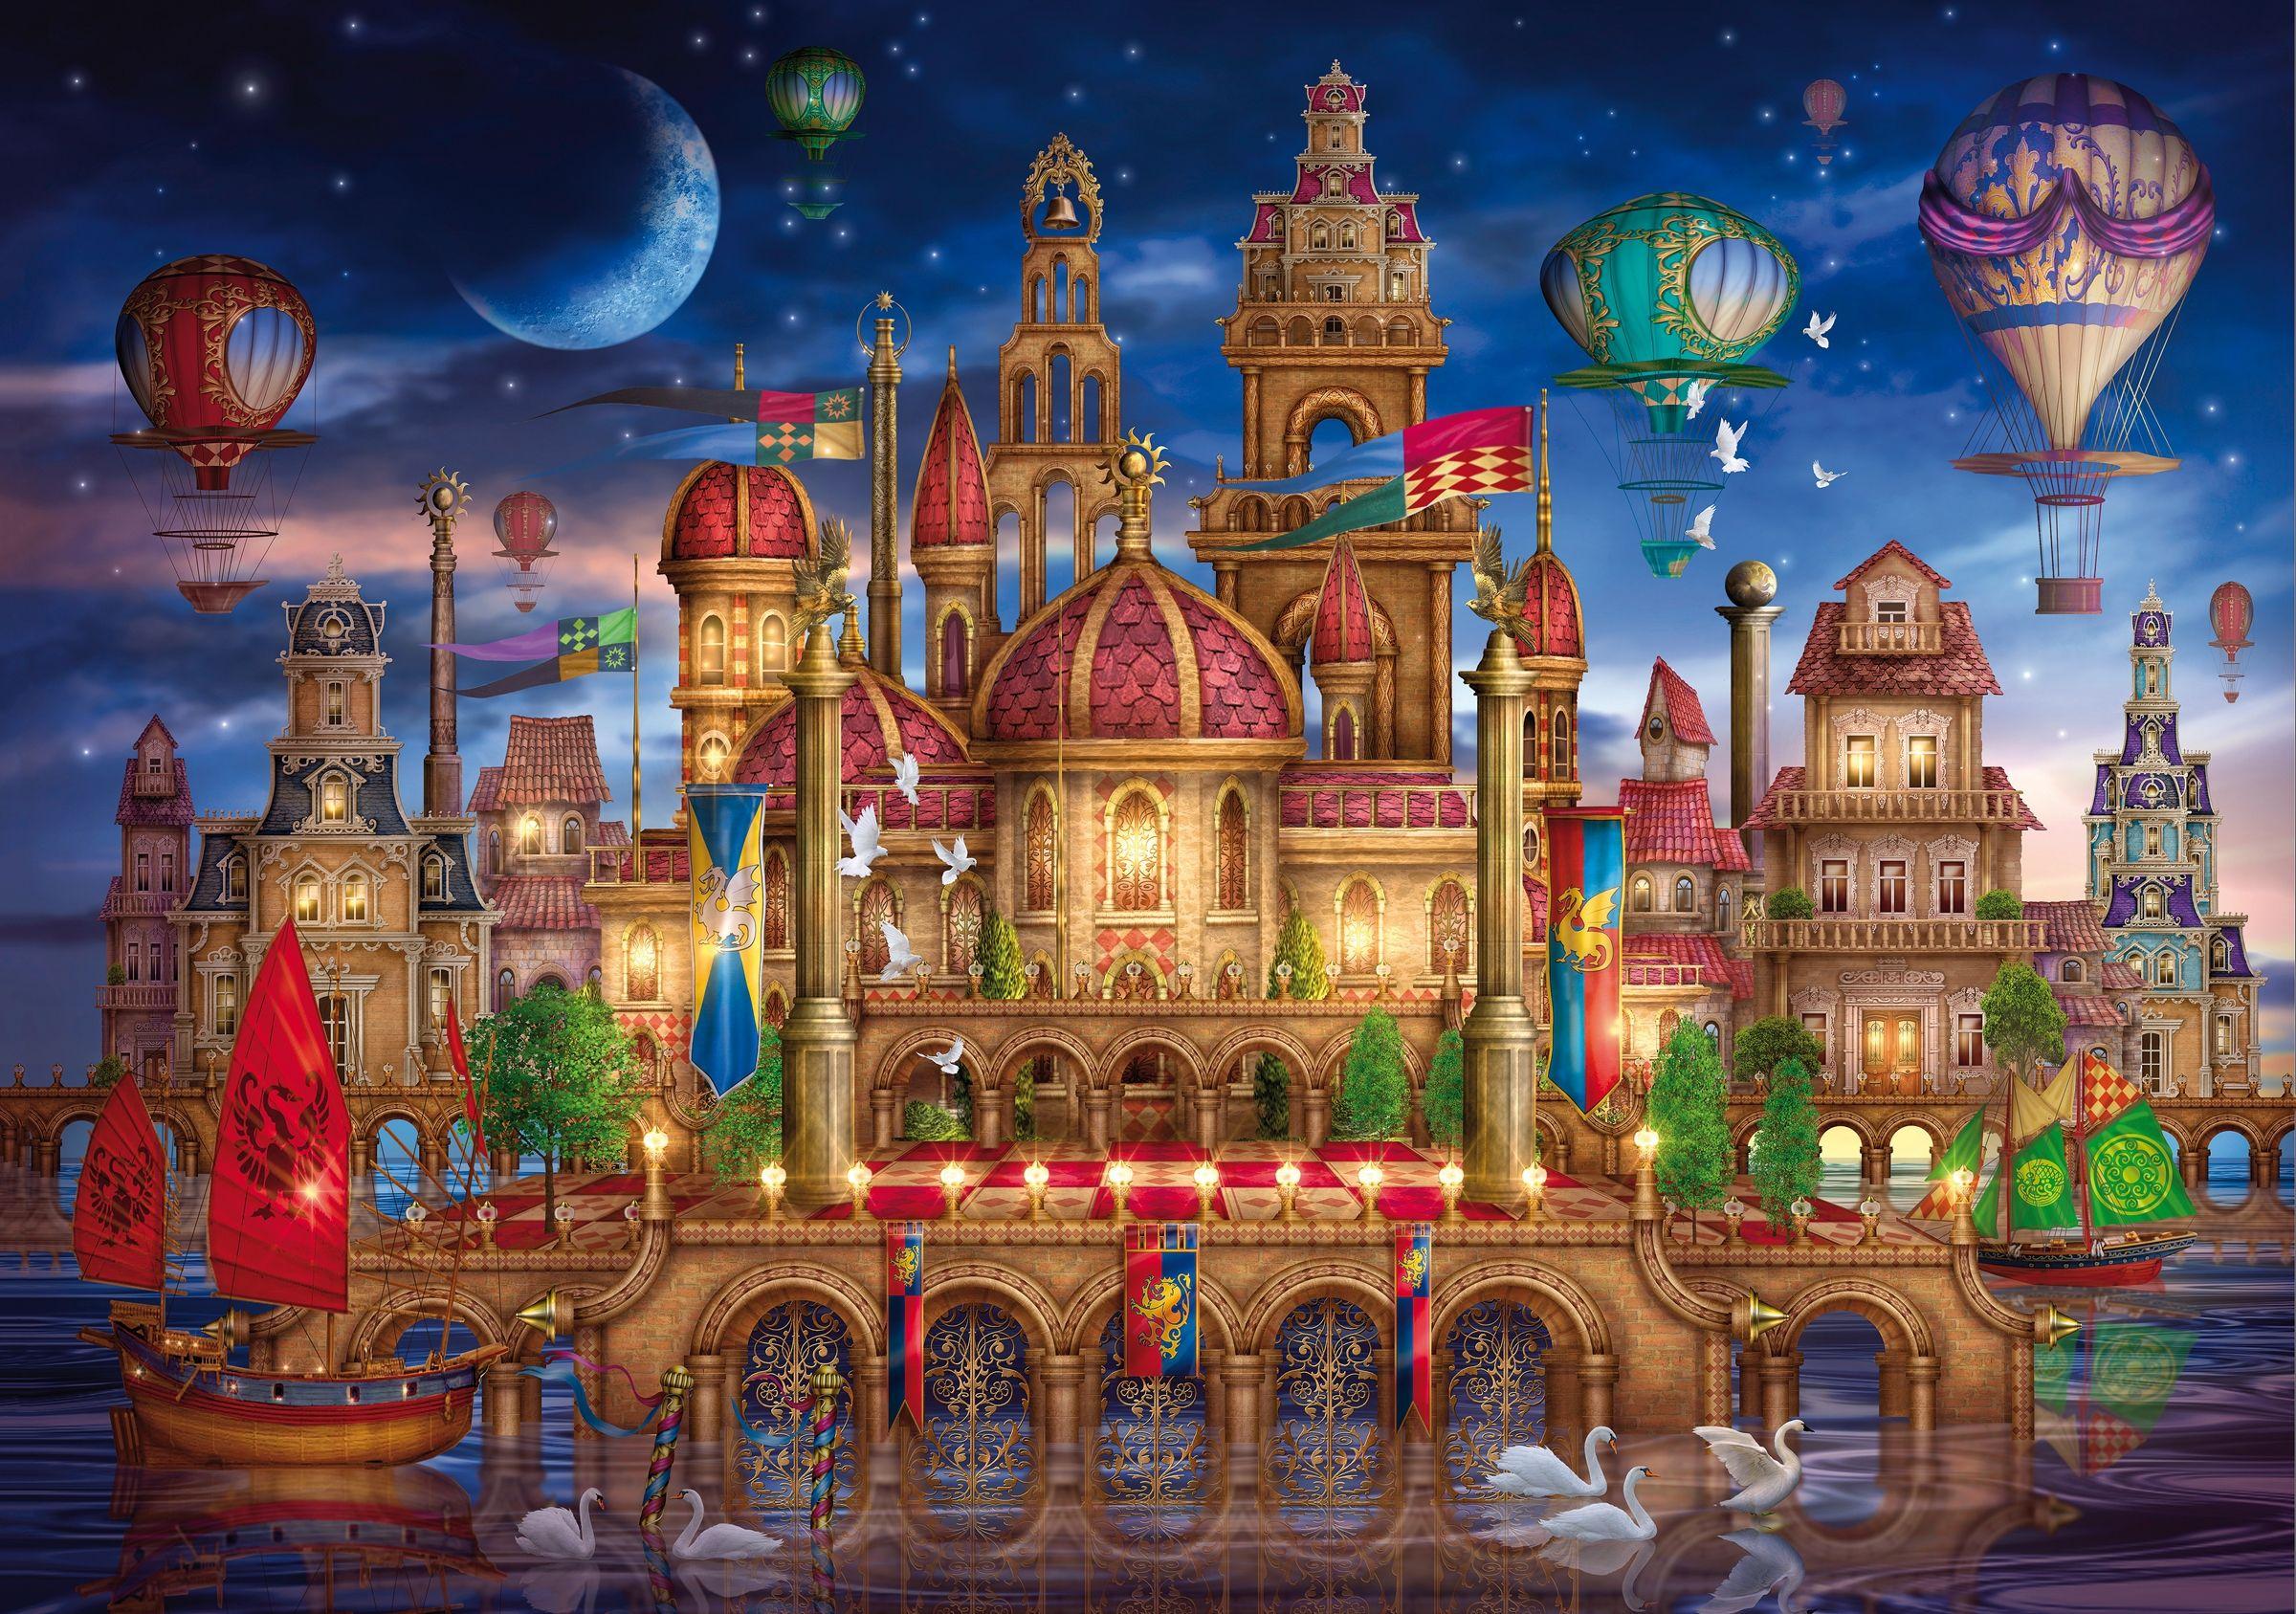 Fantasy Palace Ilustracoes Artistas Tarot Decks